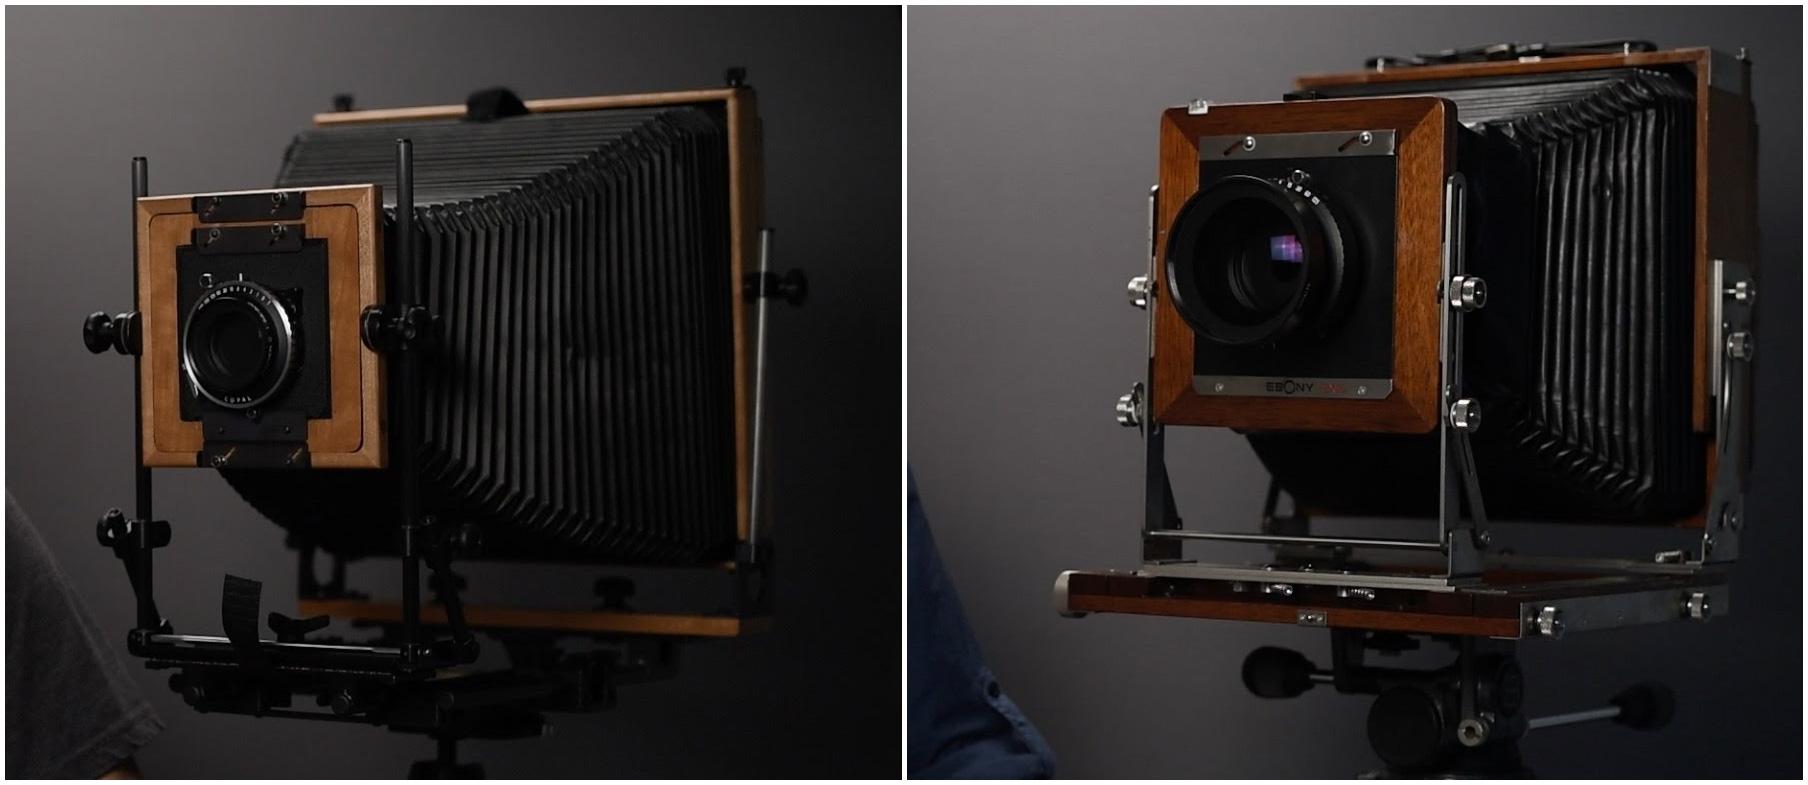 Ritter 8x10 Ebony 8x10 Large Format Camera